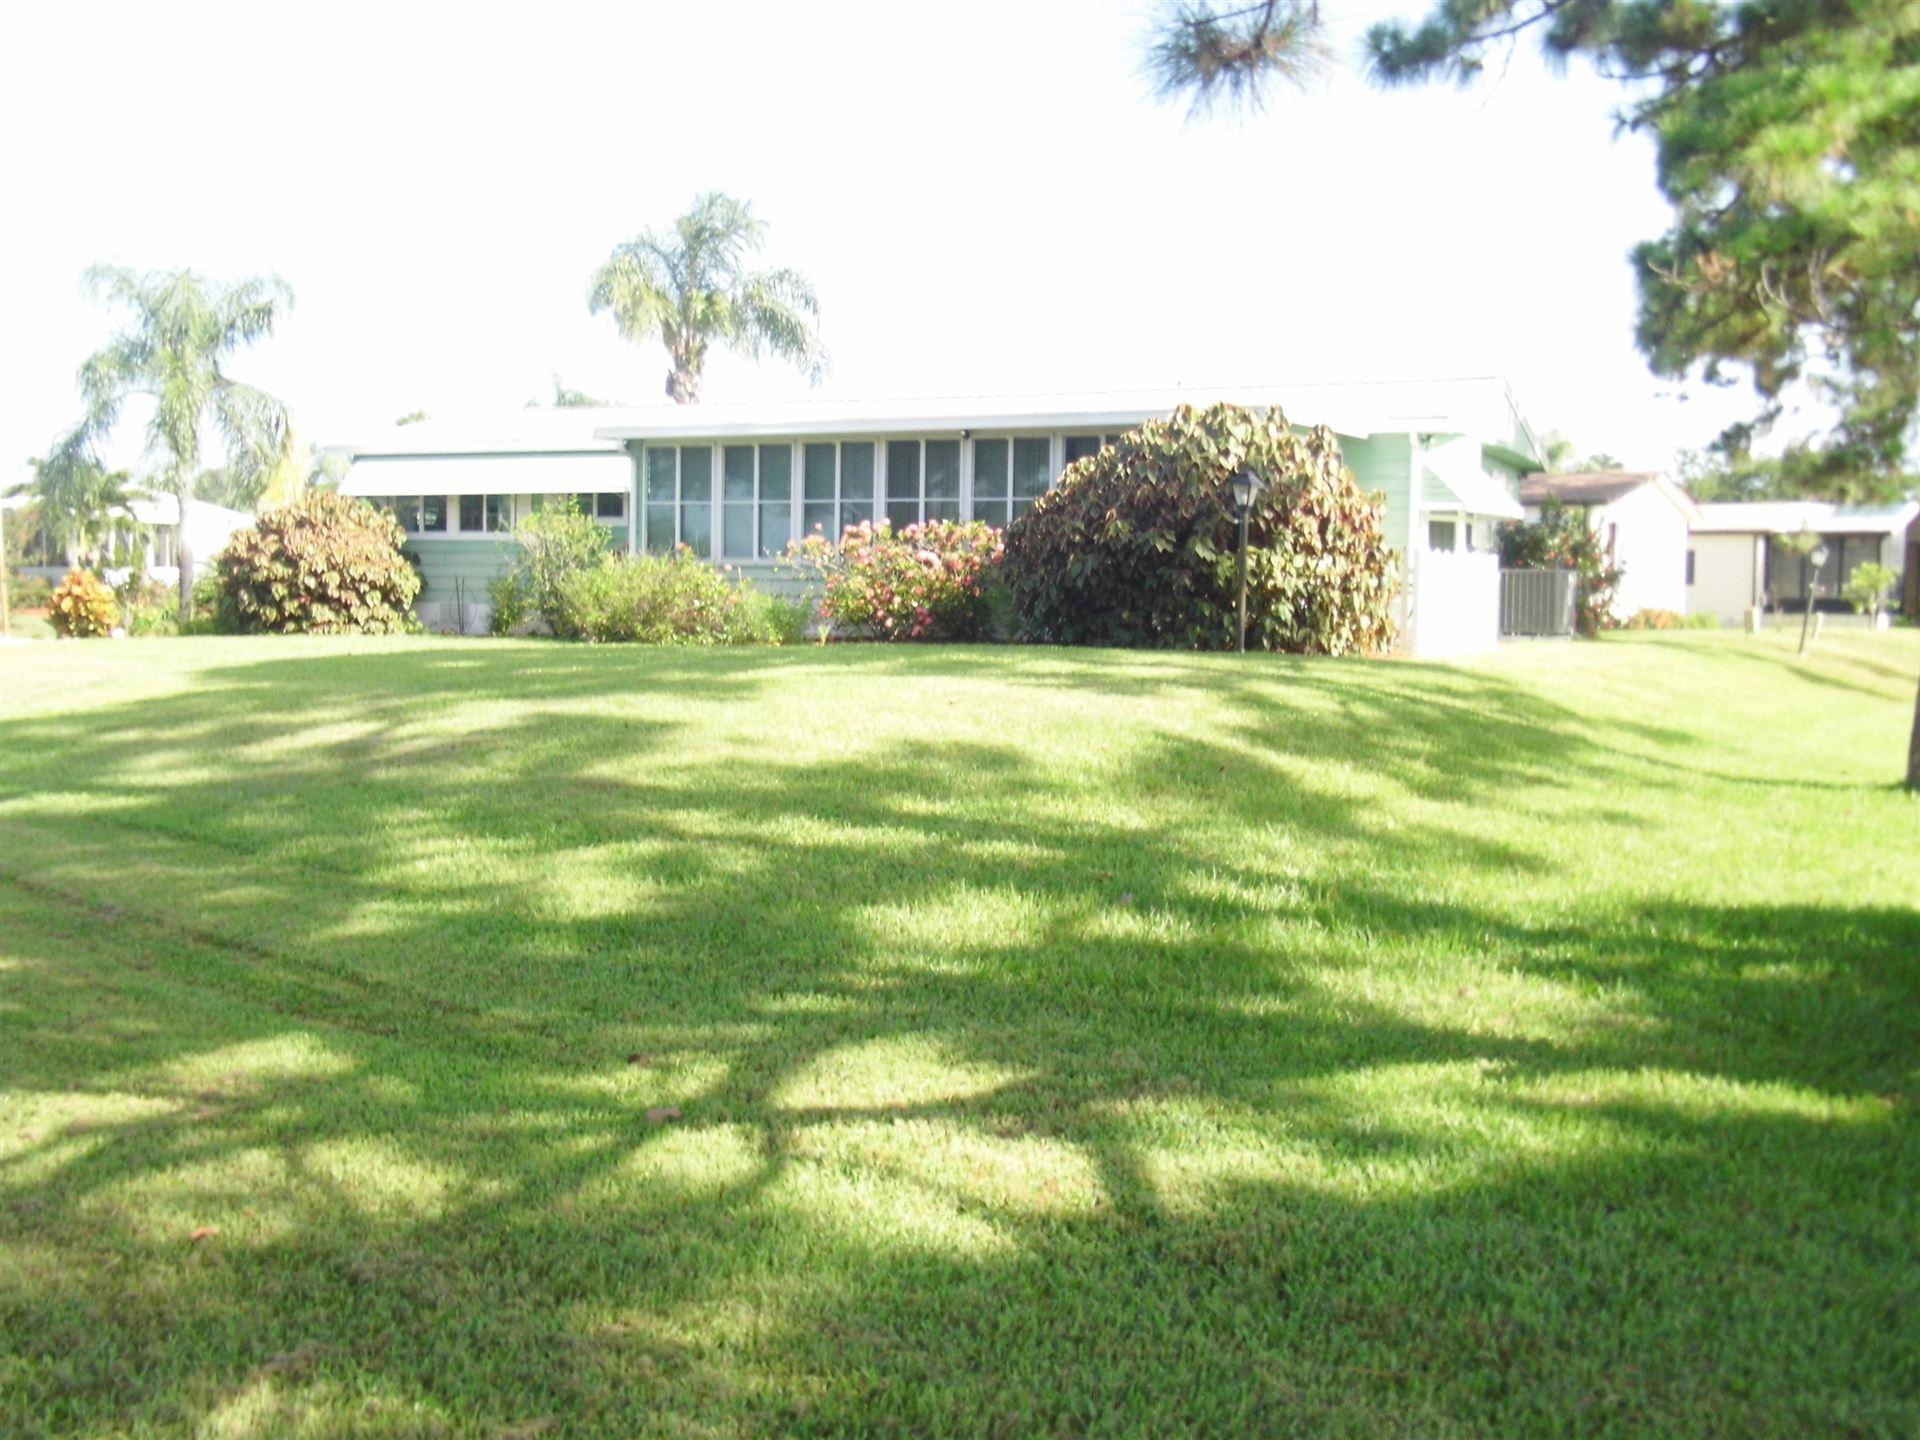 Photo of 8198 Buckthorn Circle, Port Saint Lucie, FL 34952 (MLS # RX-10636070)